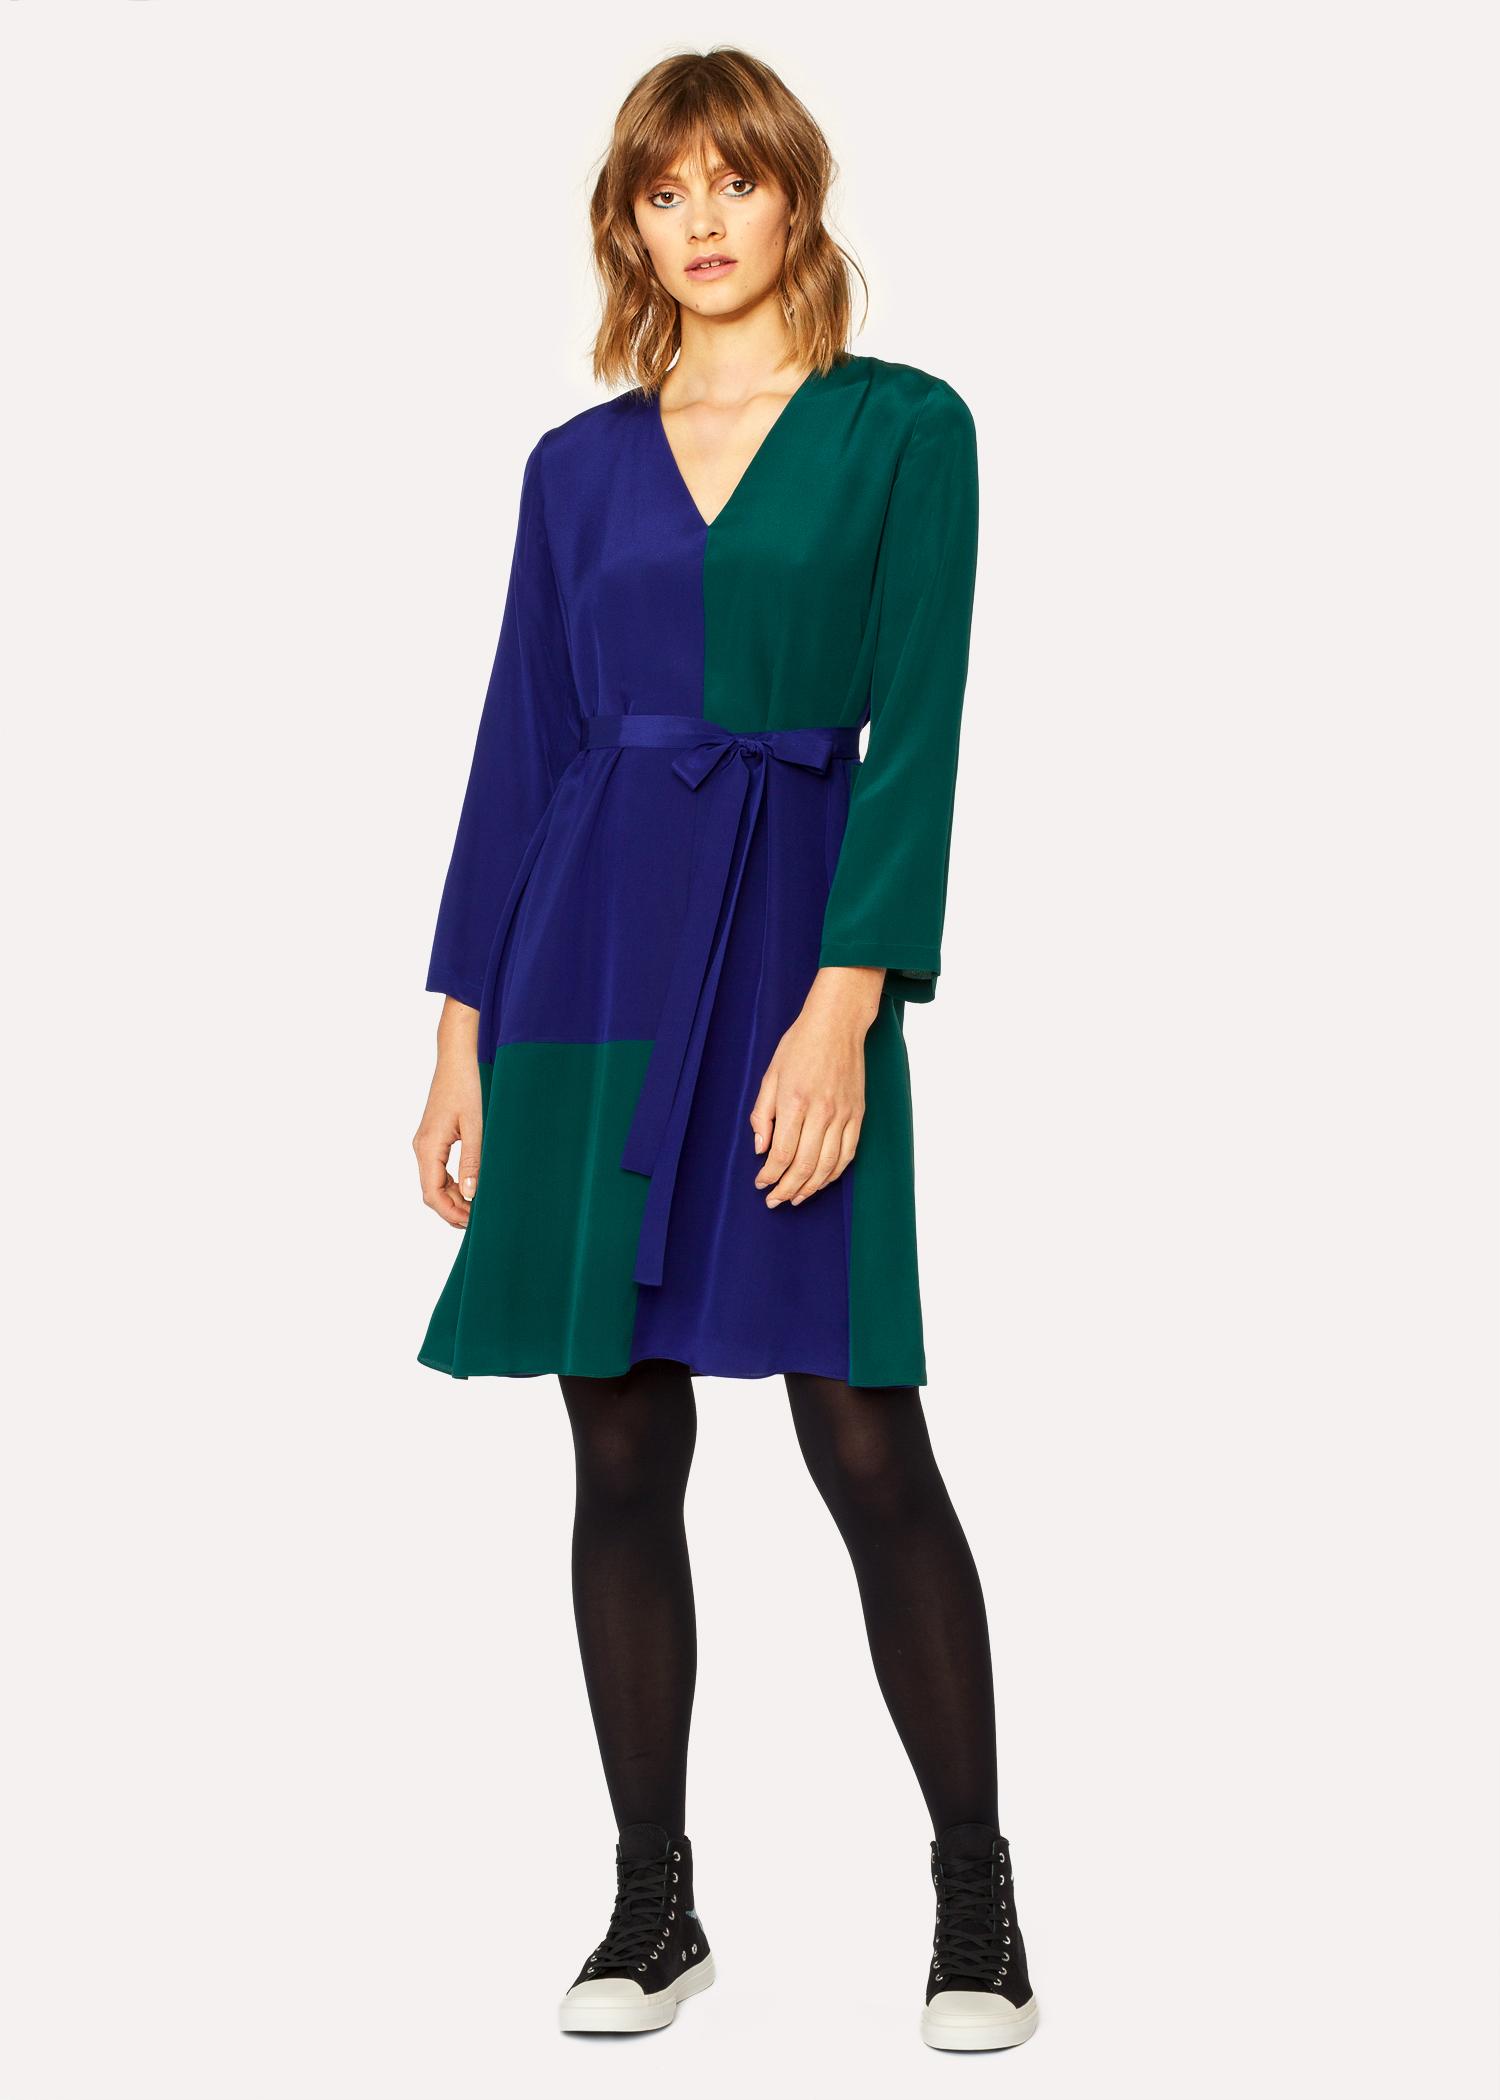 Women S V Neck Cobalt Blue And Green Colour Block Dress Paul Smith